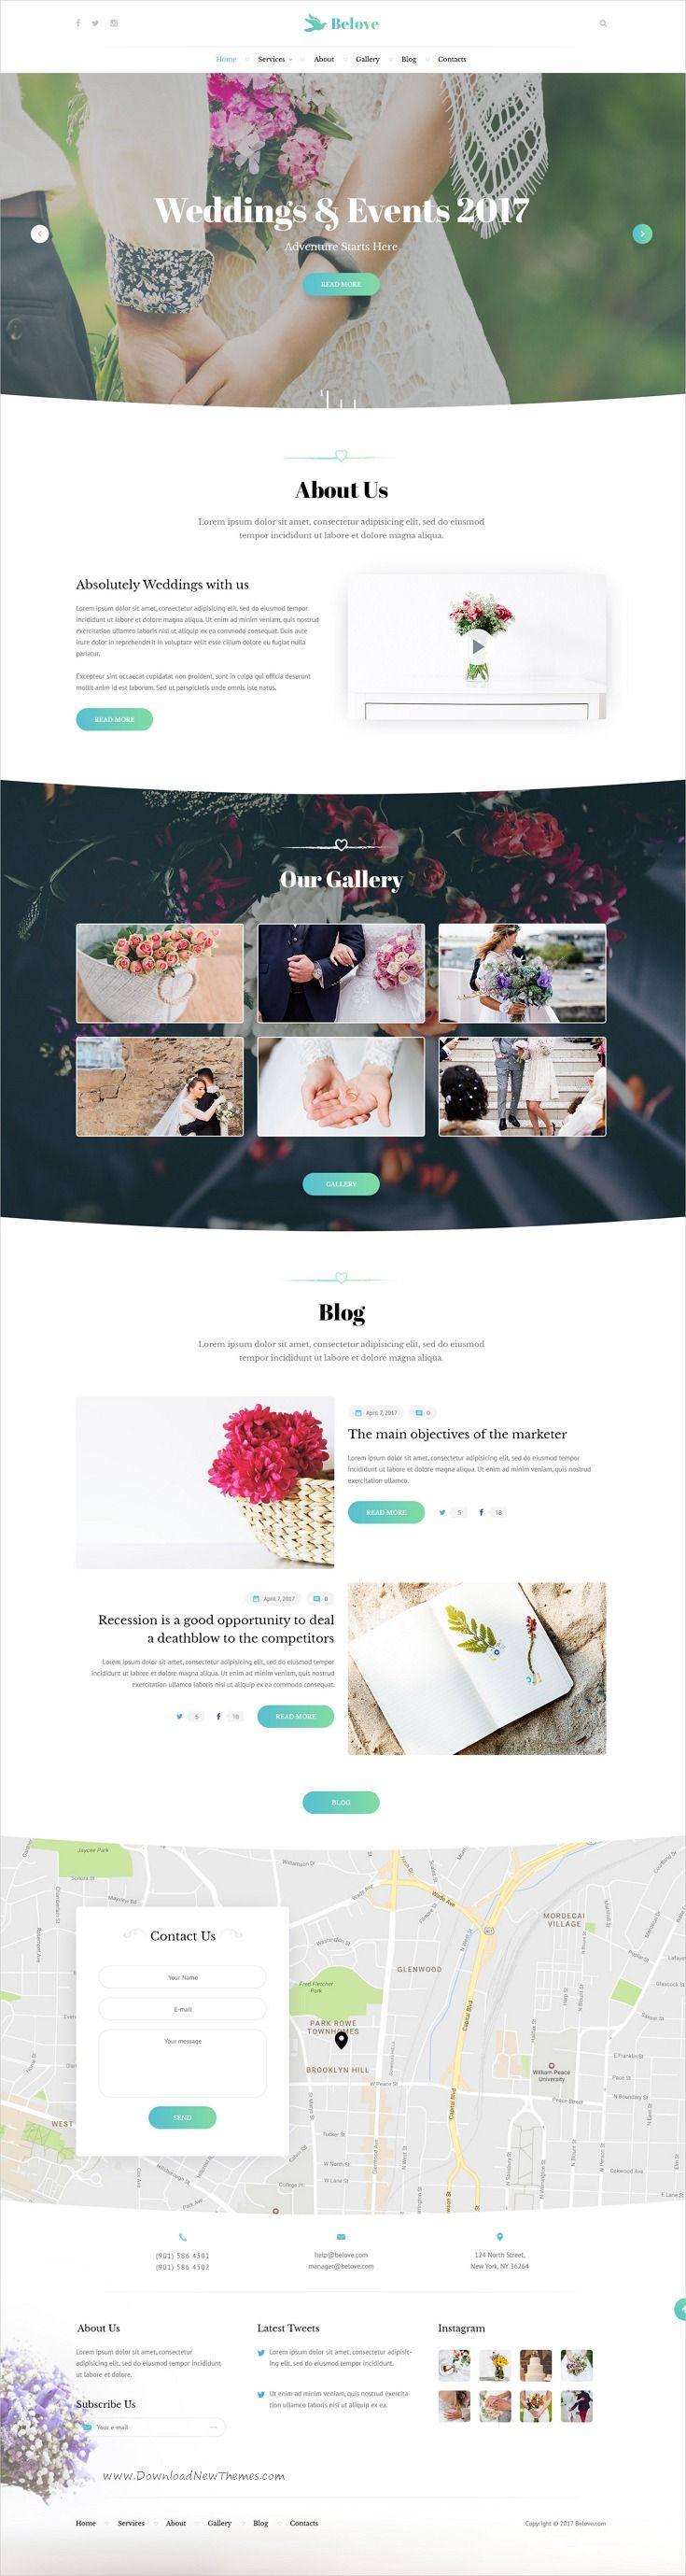 Best Wedding Website Templates Ideas On Pinterest Web Design